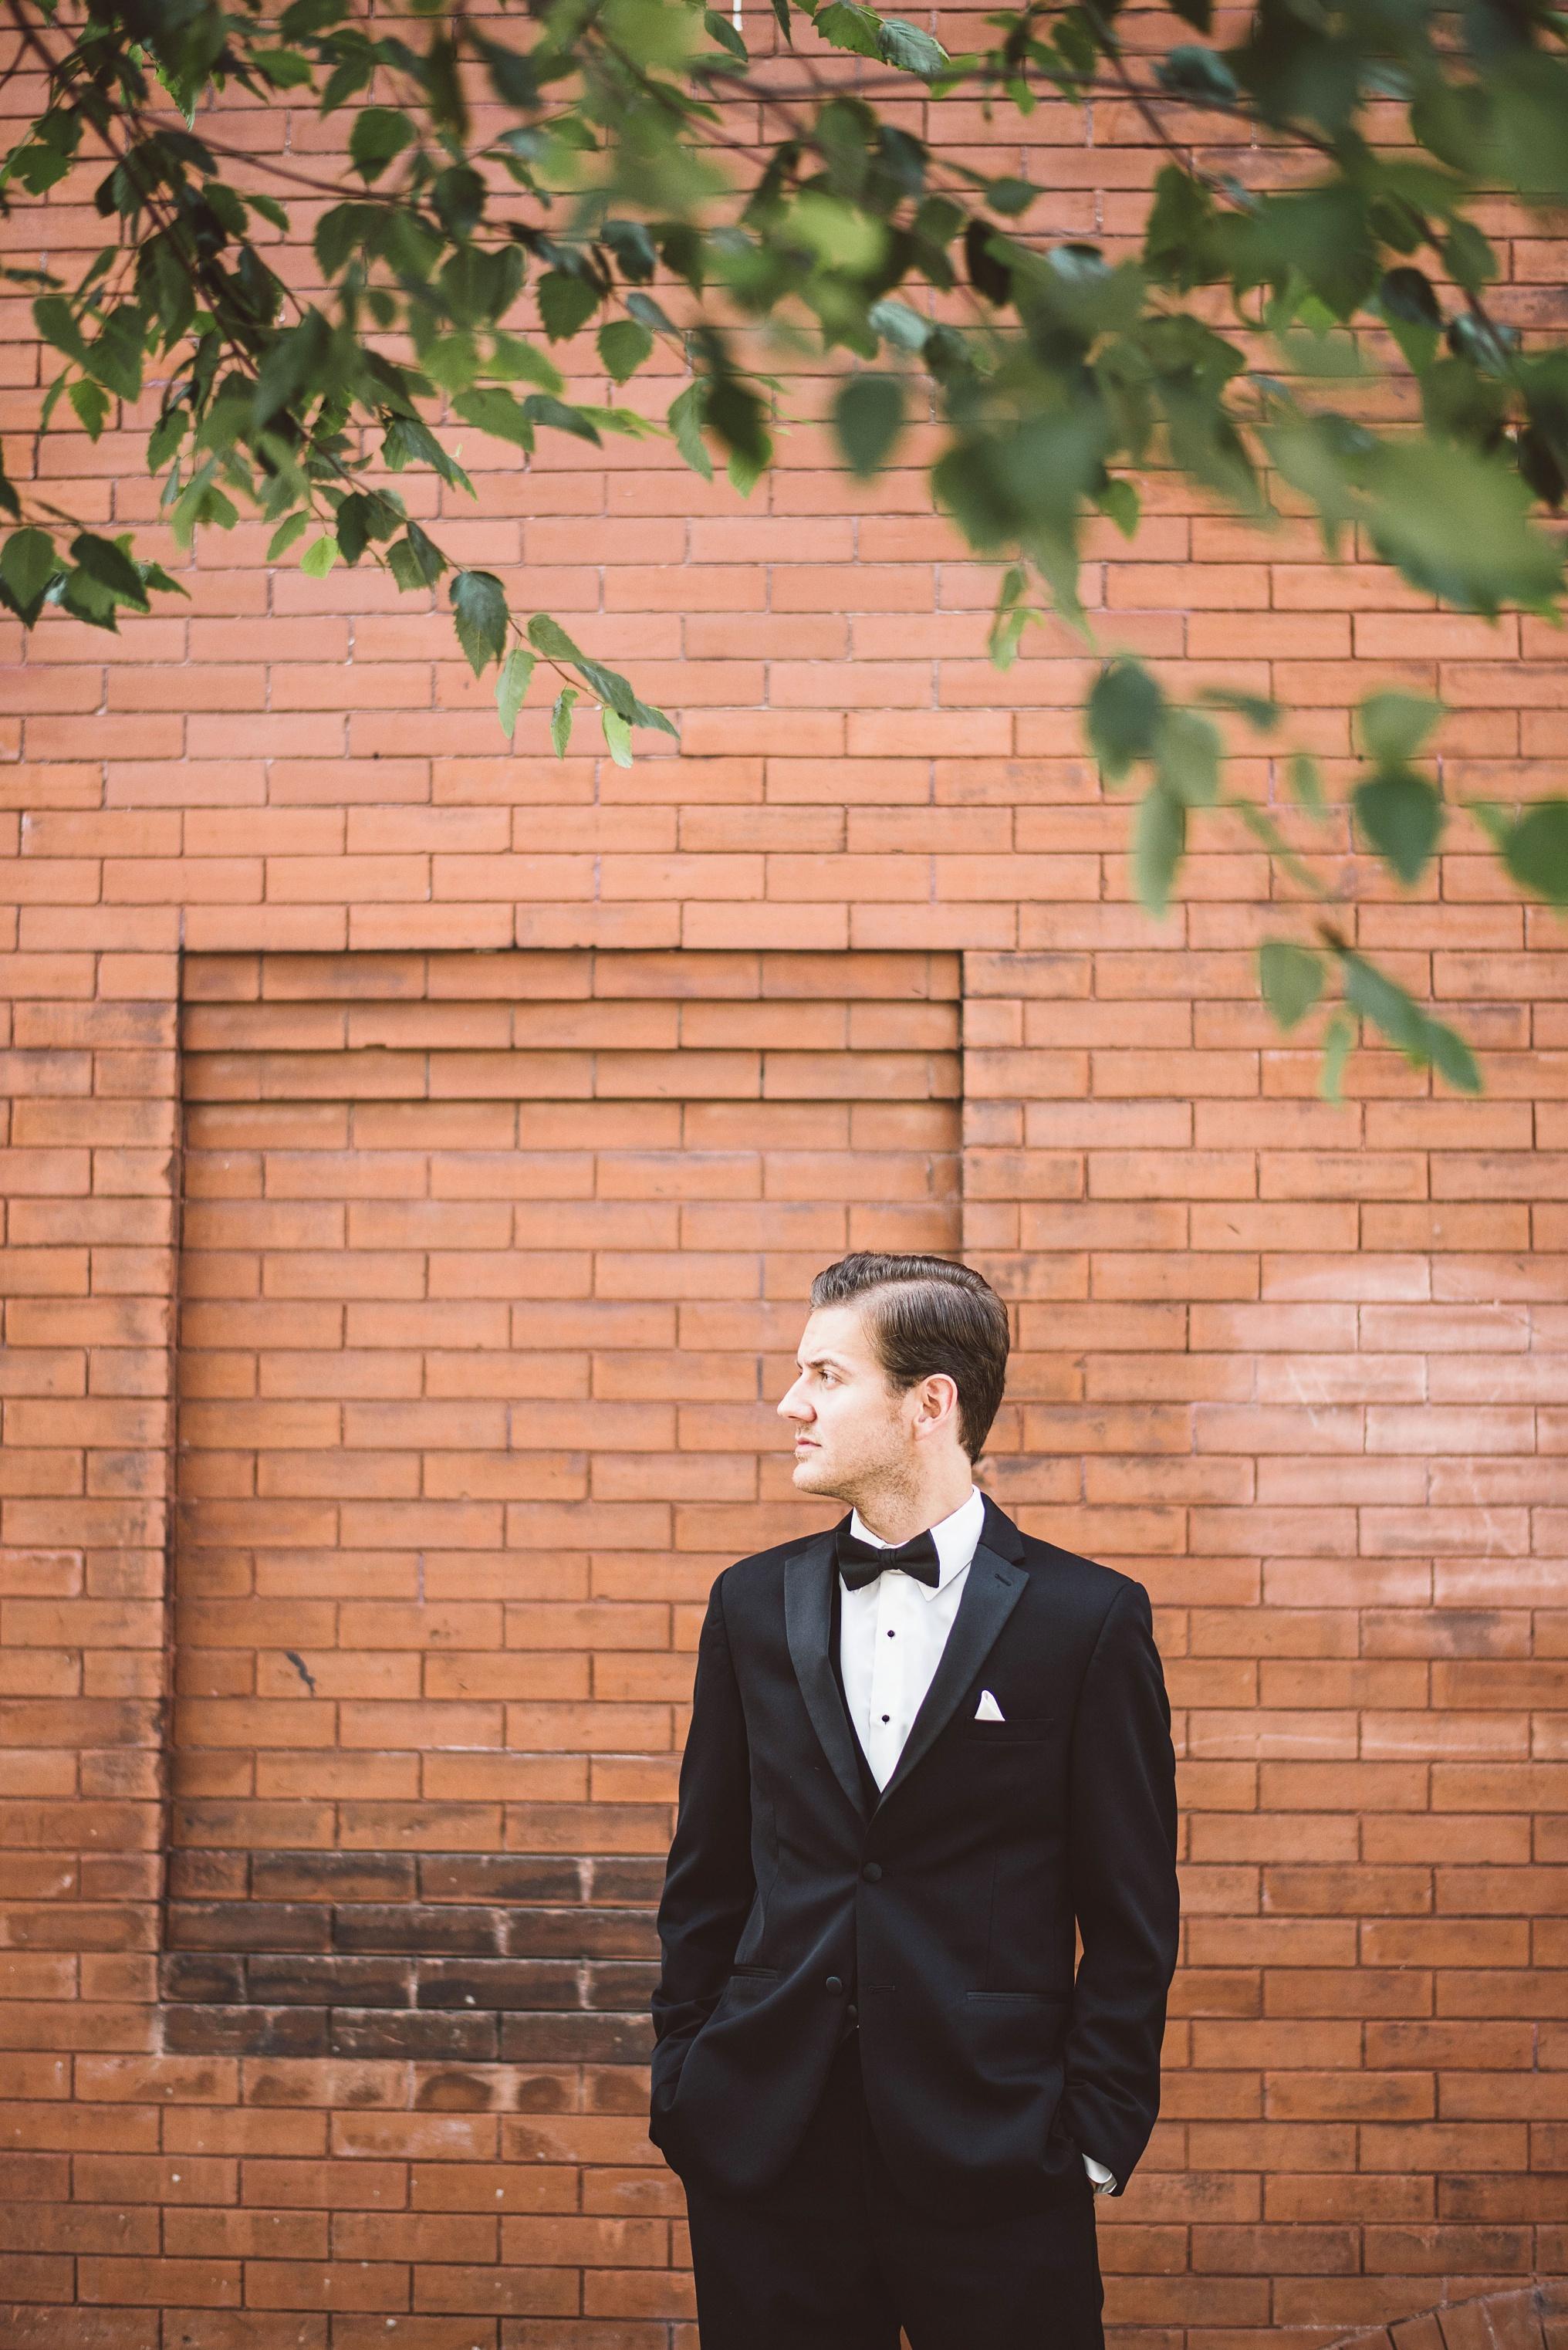 best_wedding_photography_2017_by_lucas_botz_photography_166.jpg